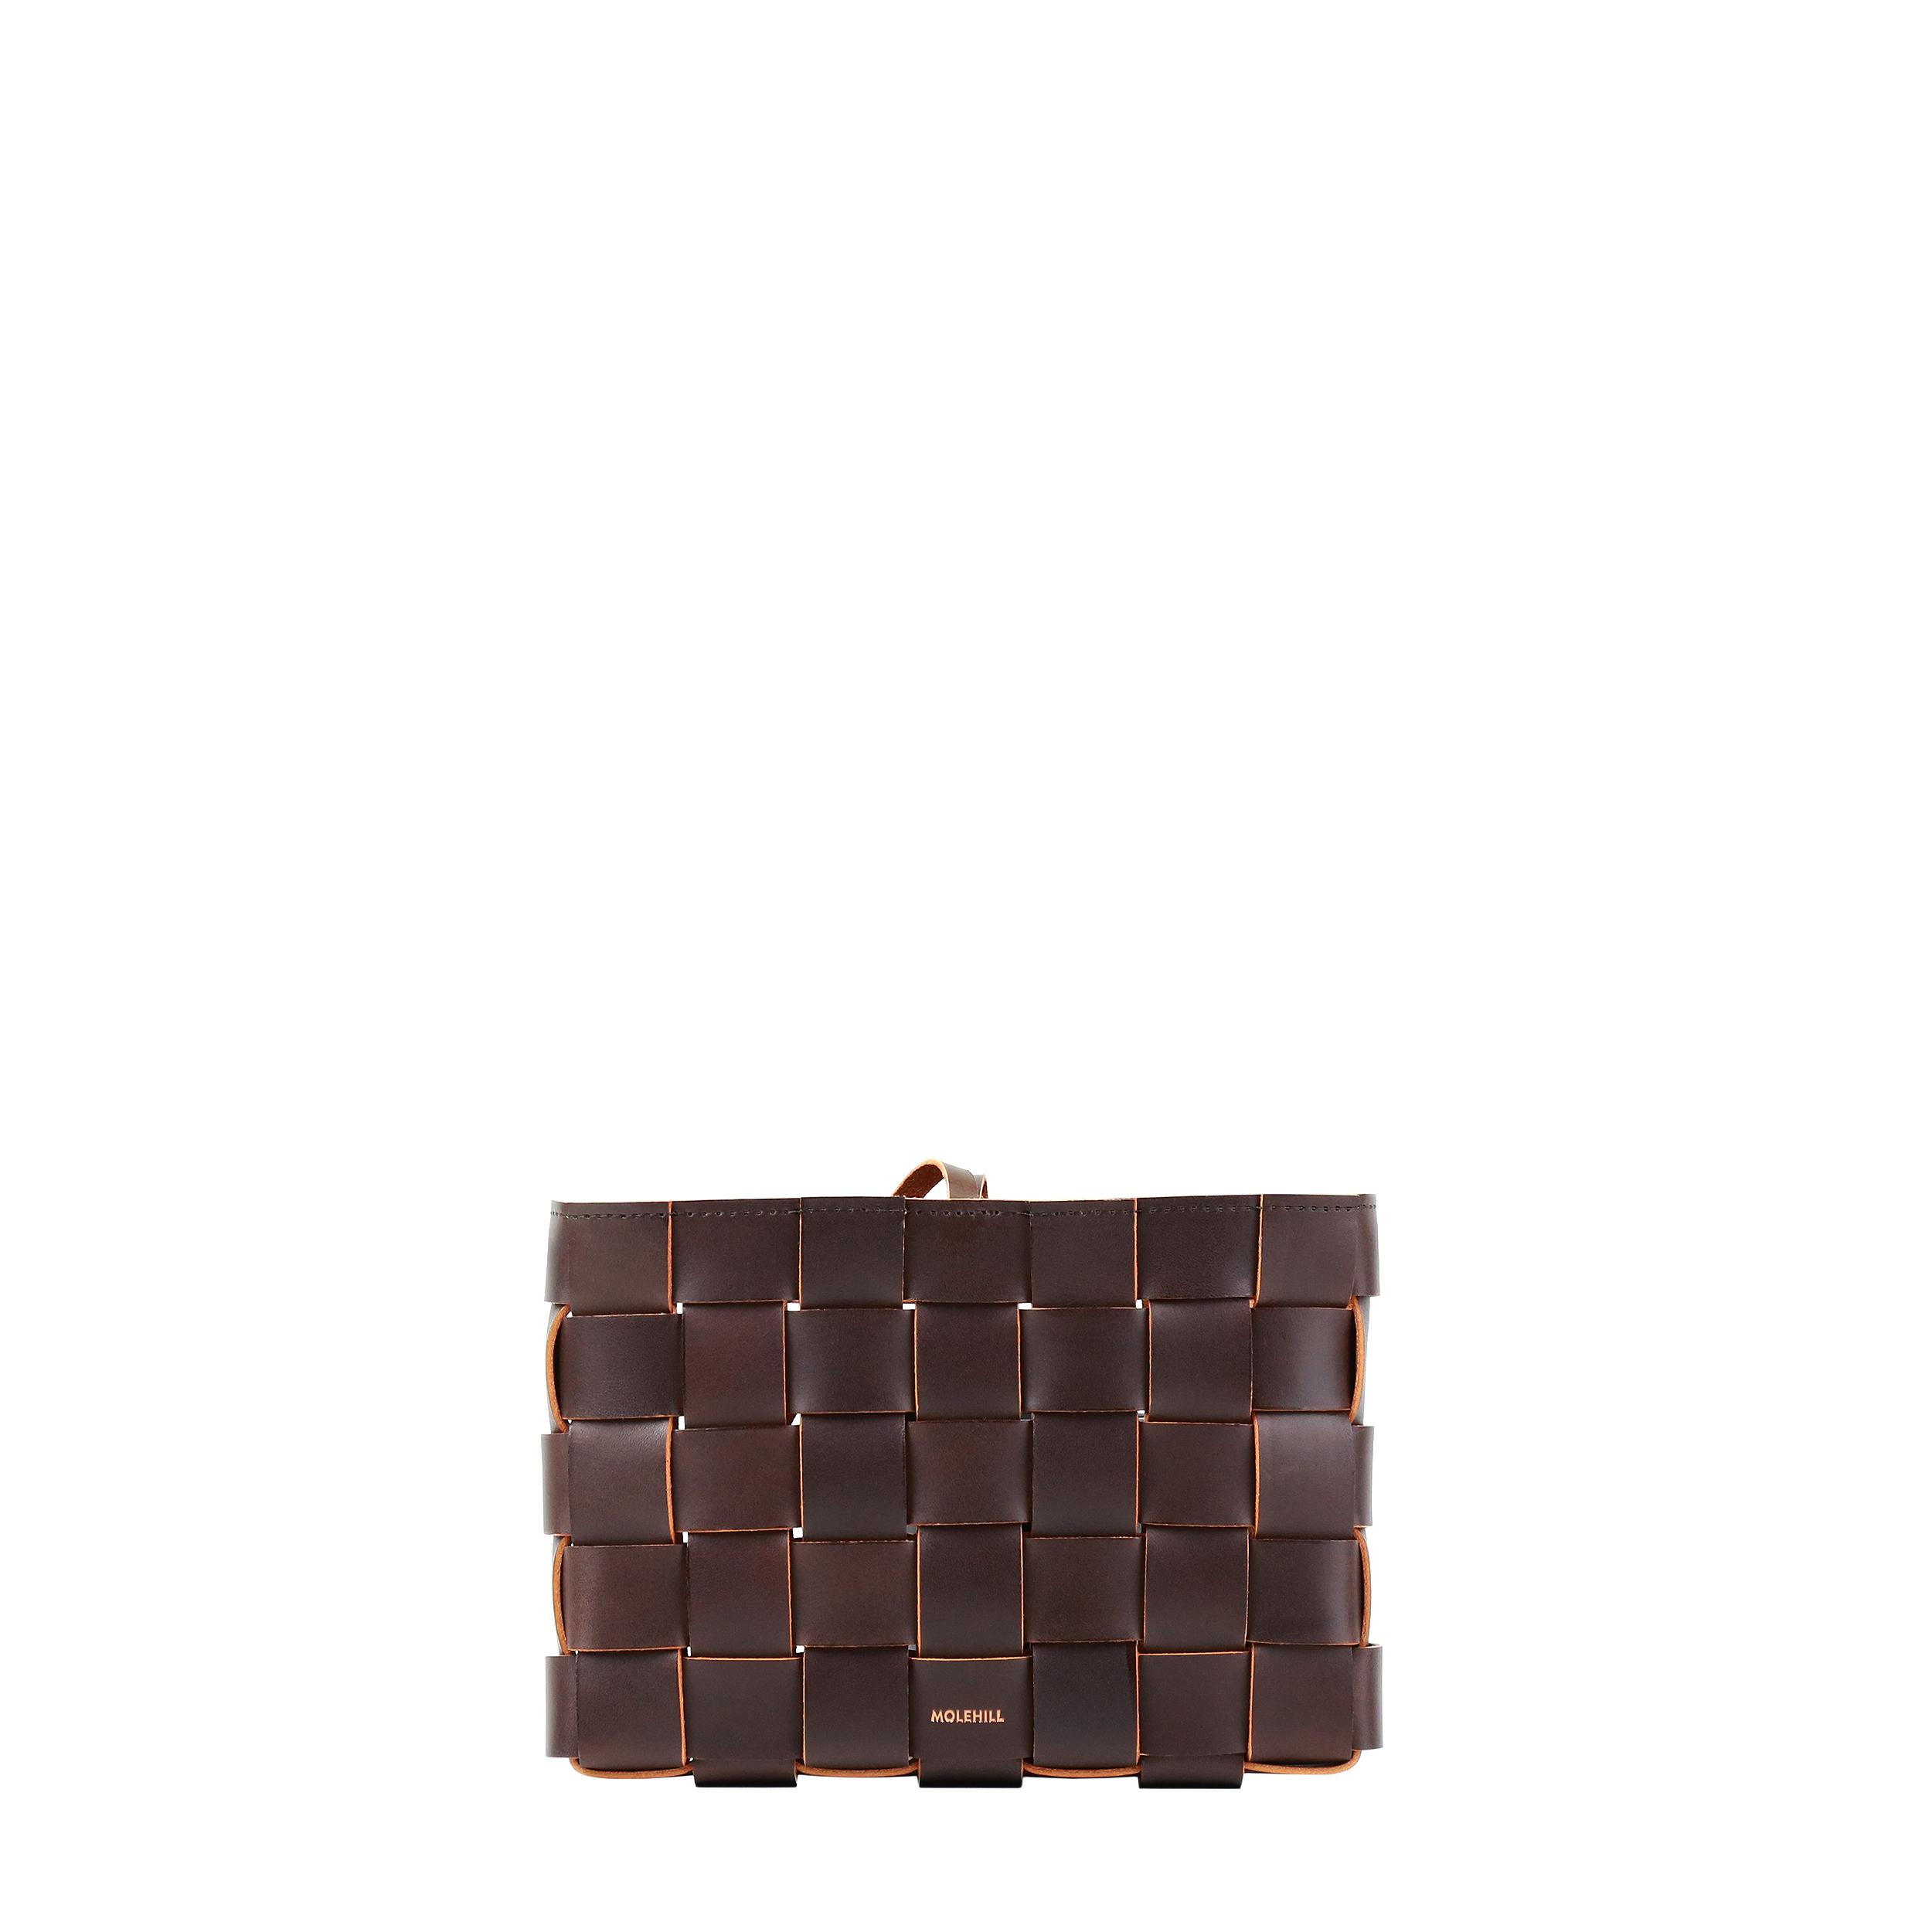 Pane Crossbodgt Woven Bag Dark Chocolate 2-2